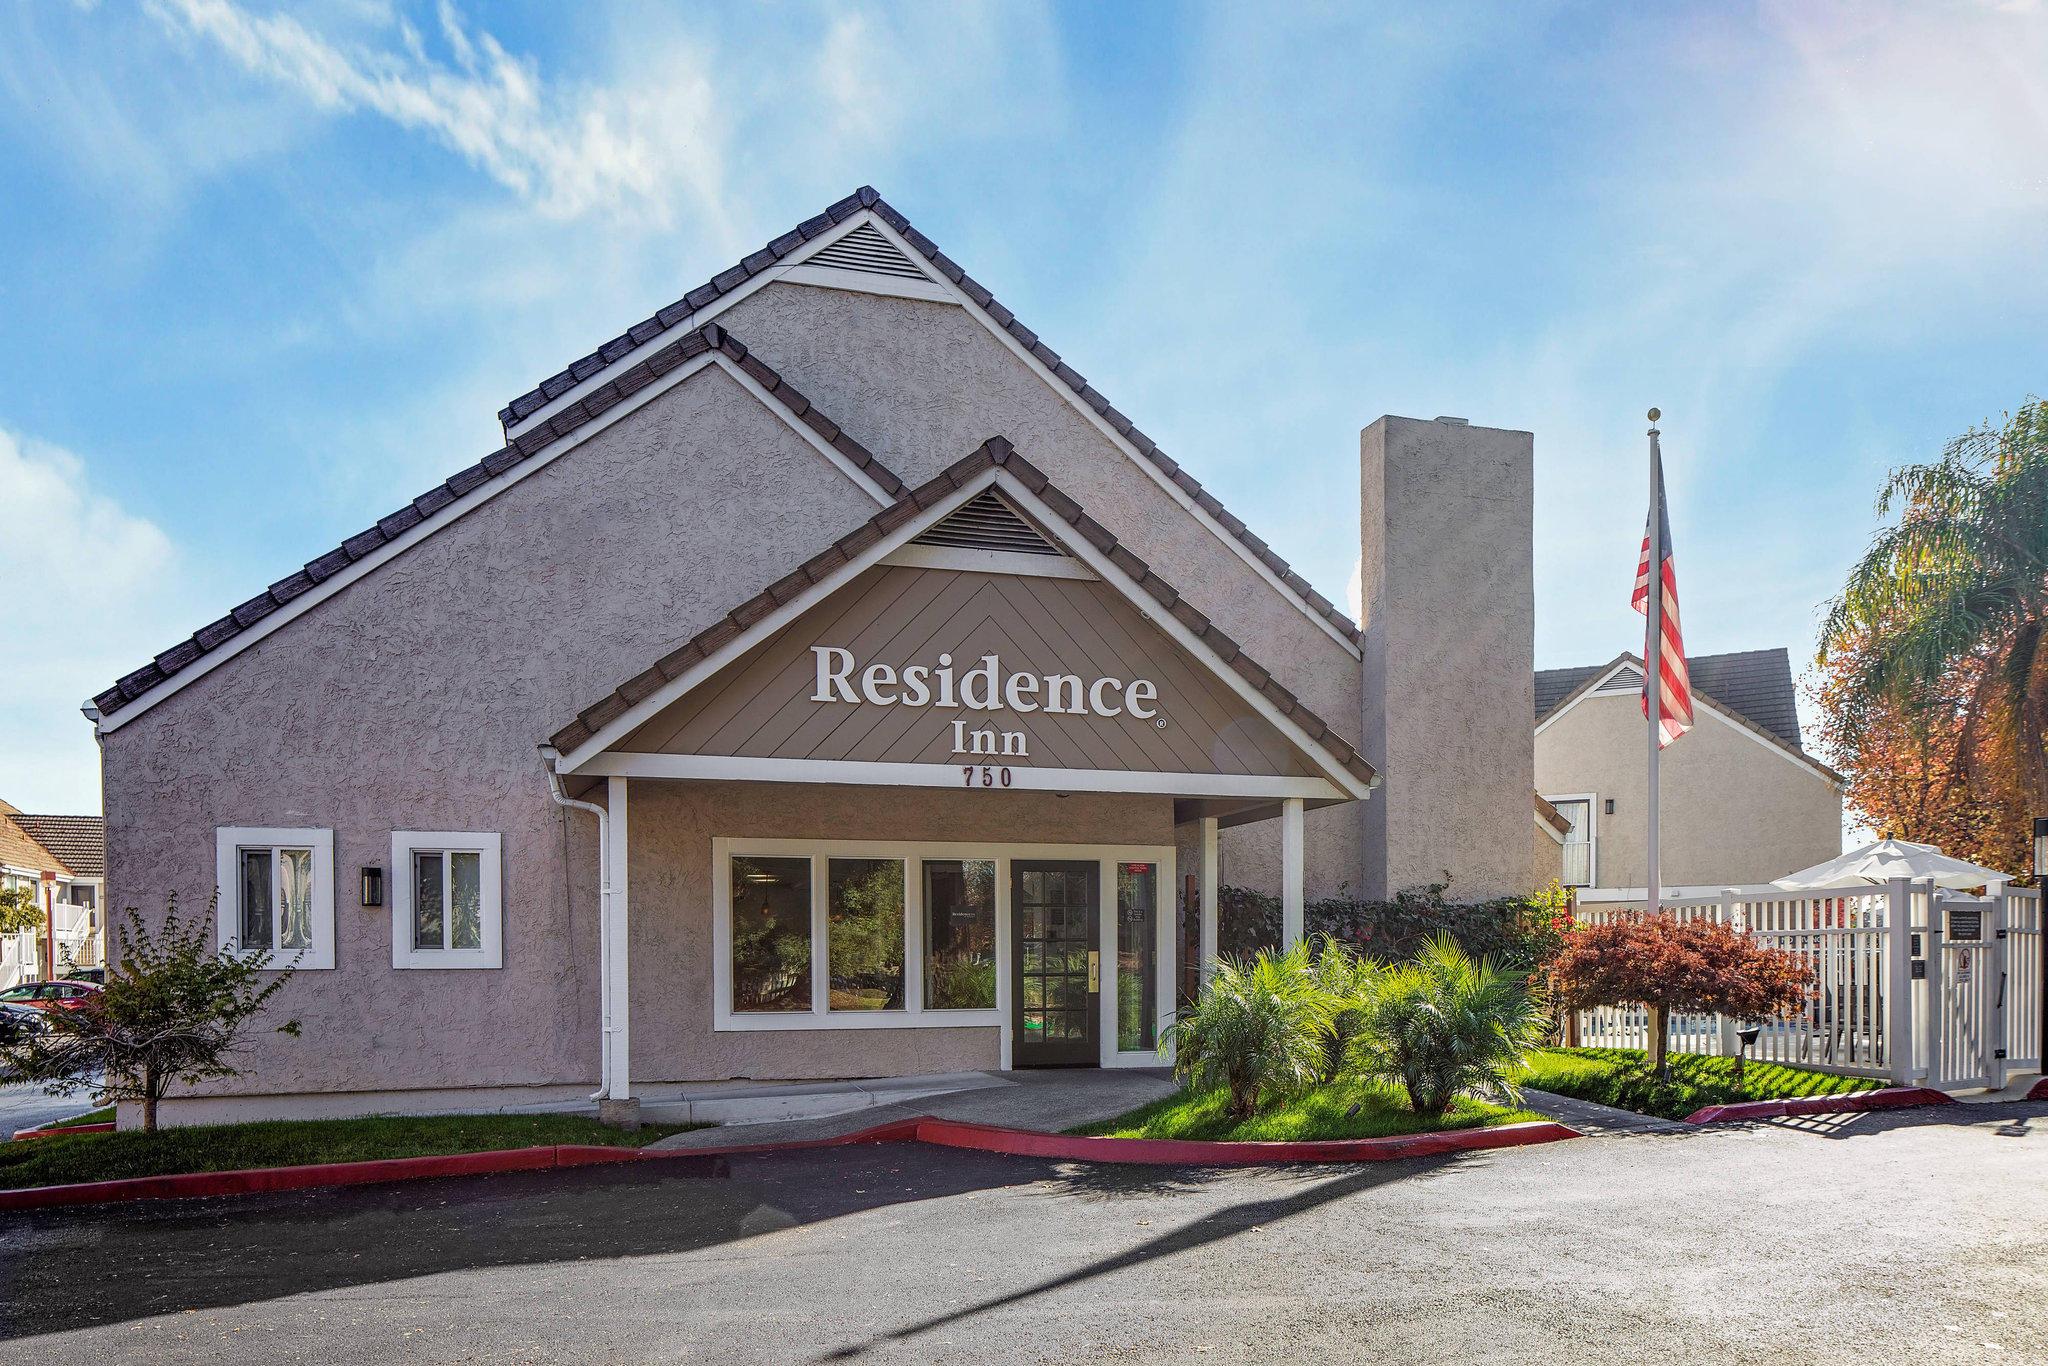 Residence Inn by Marriott Sunnyvale Silicon Valley I